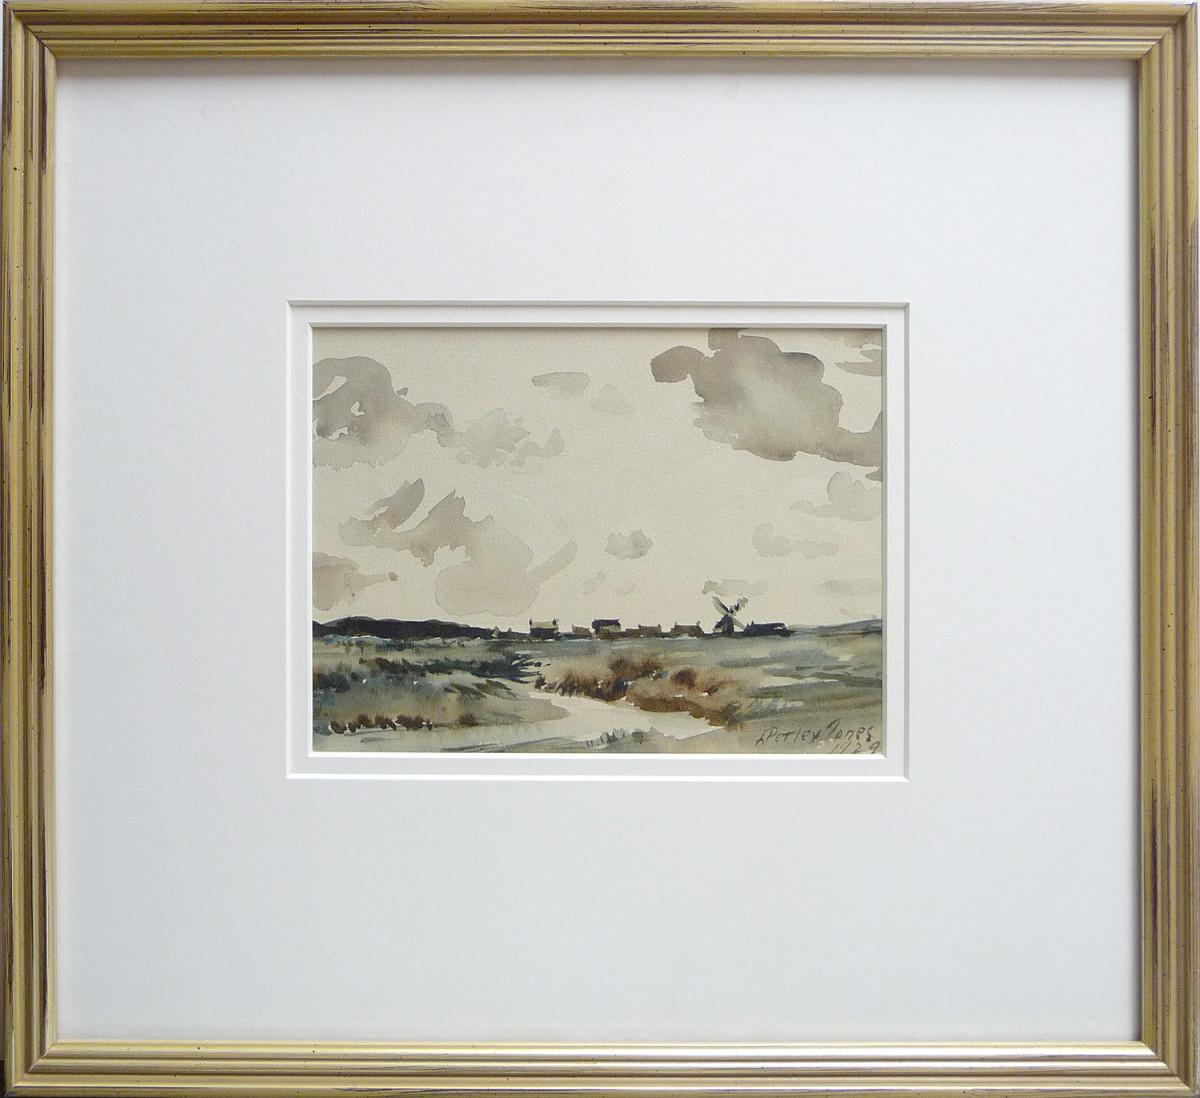 2370 - Untitled - landscape with Windmill by Llewellyn Petley-Jones (1908-1986)